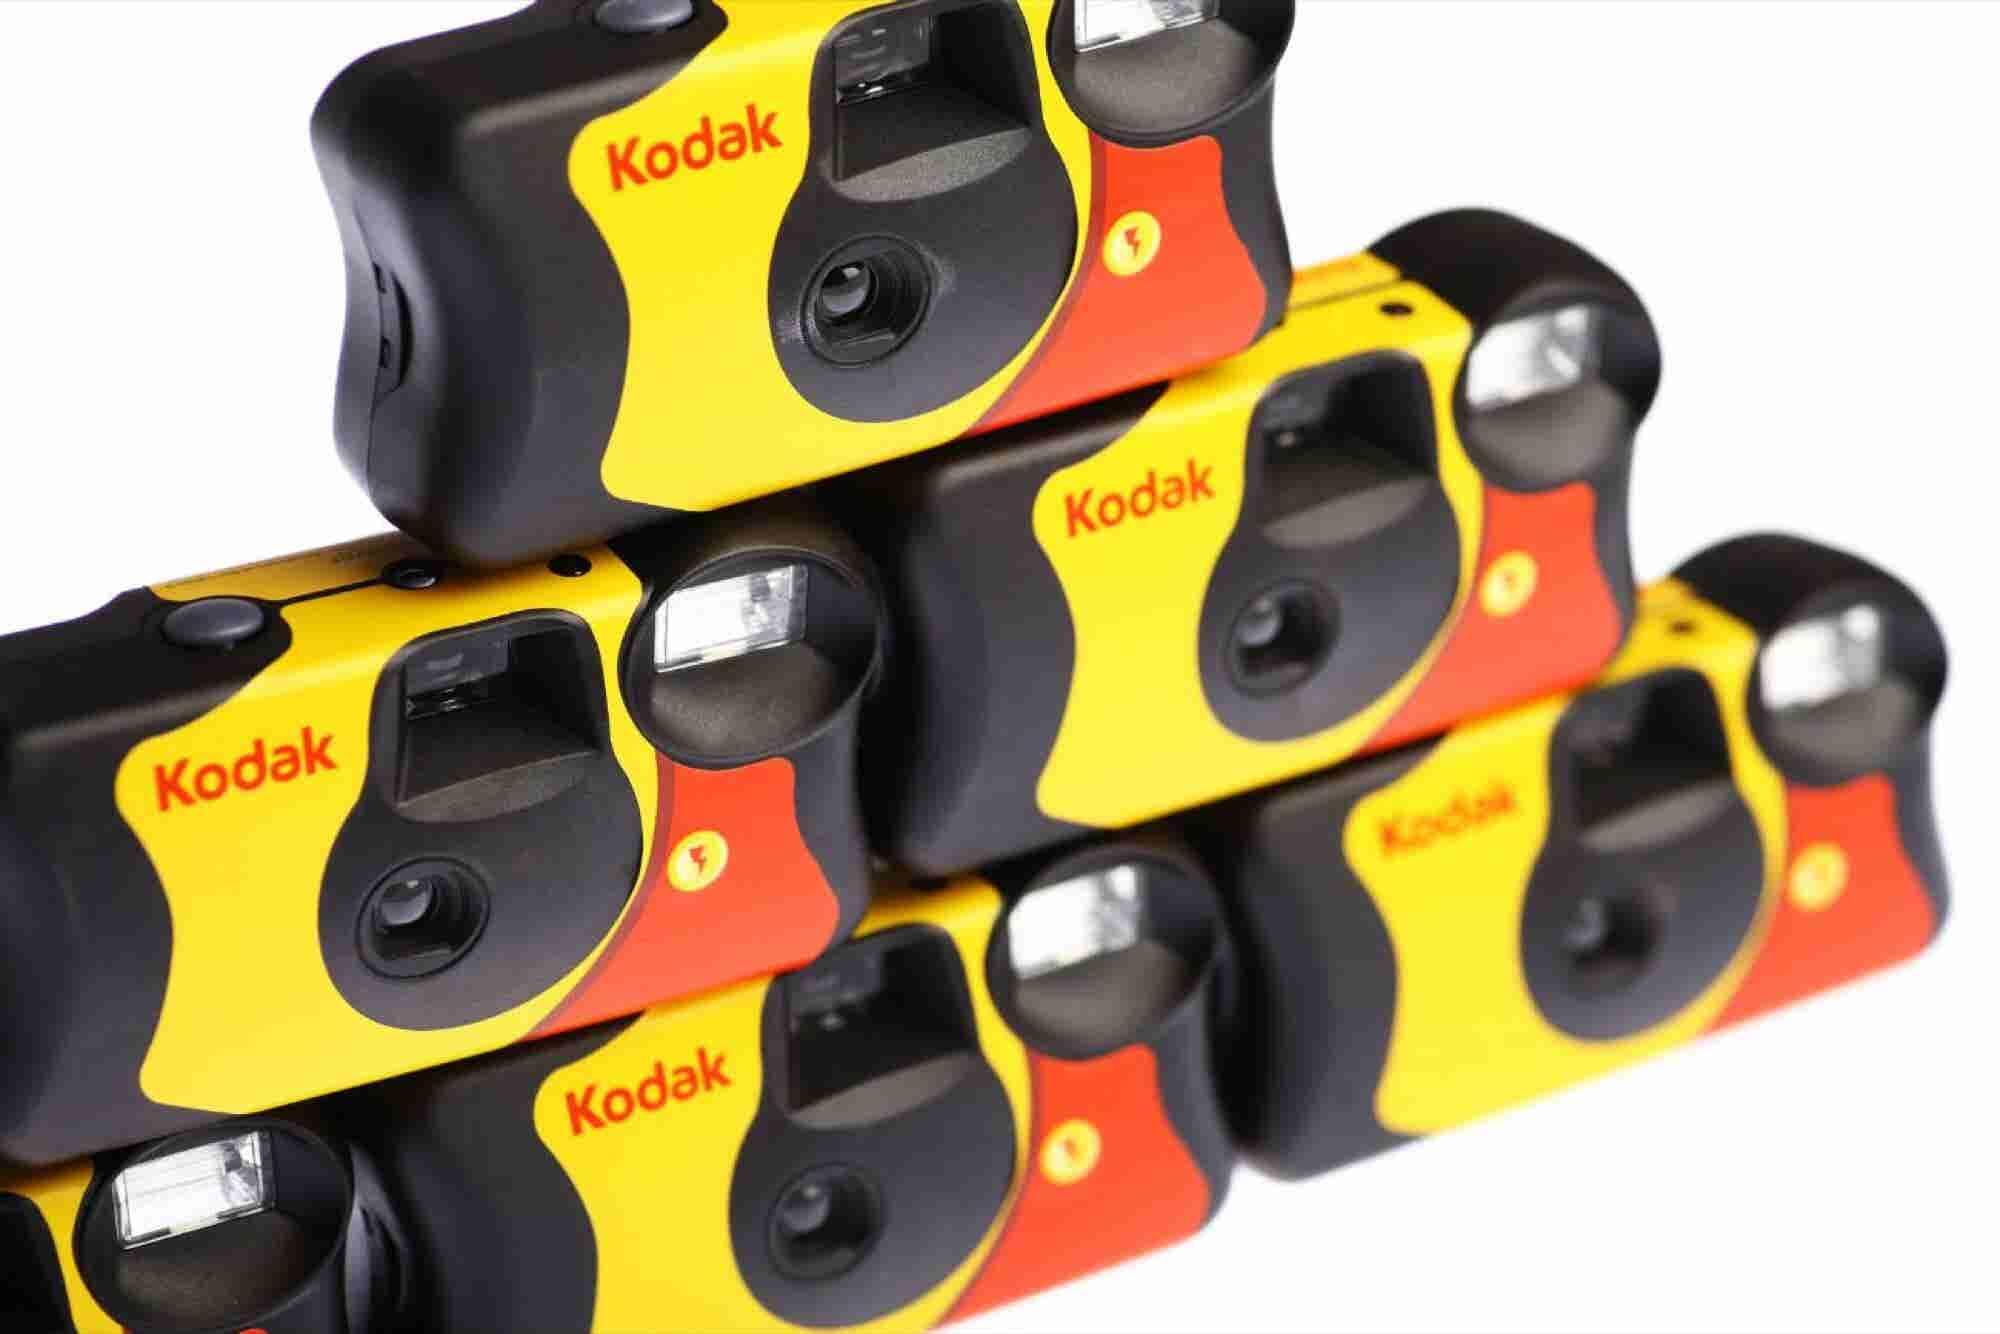 Kodak tiene su propia criptomoneda: KodakCoin